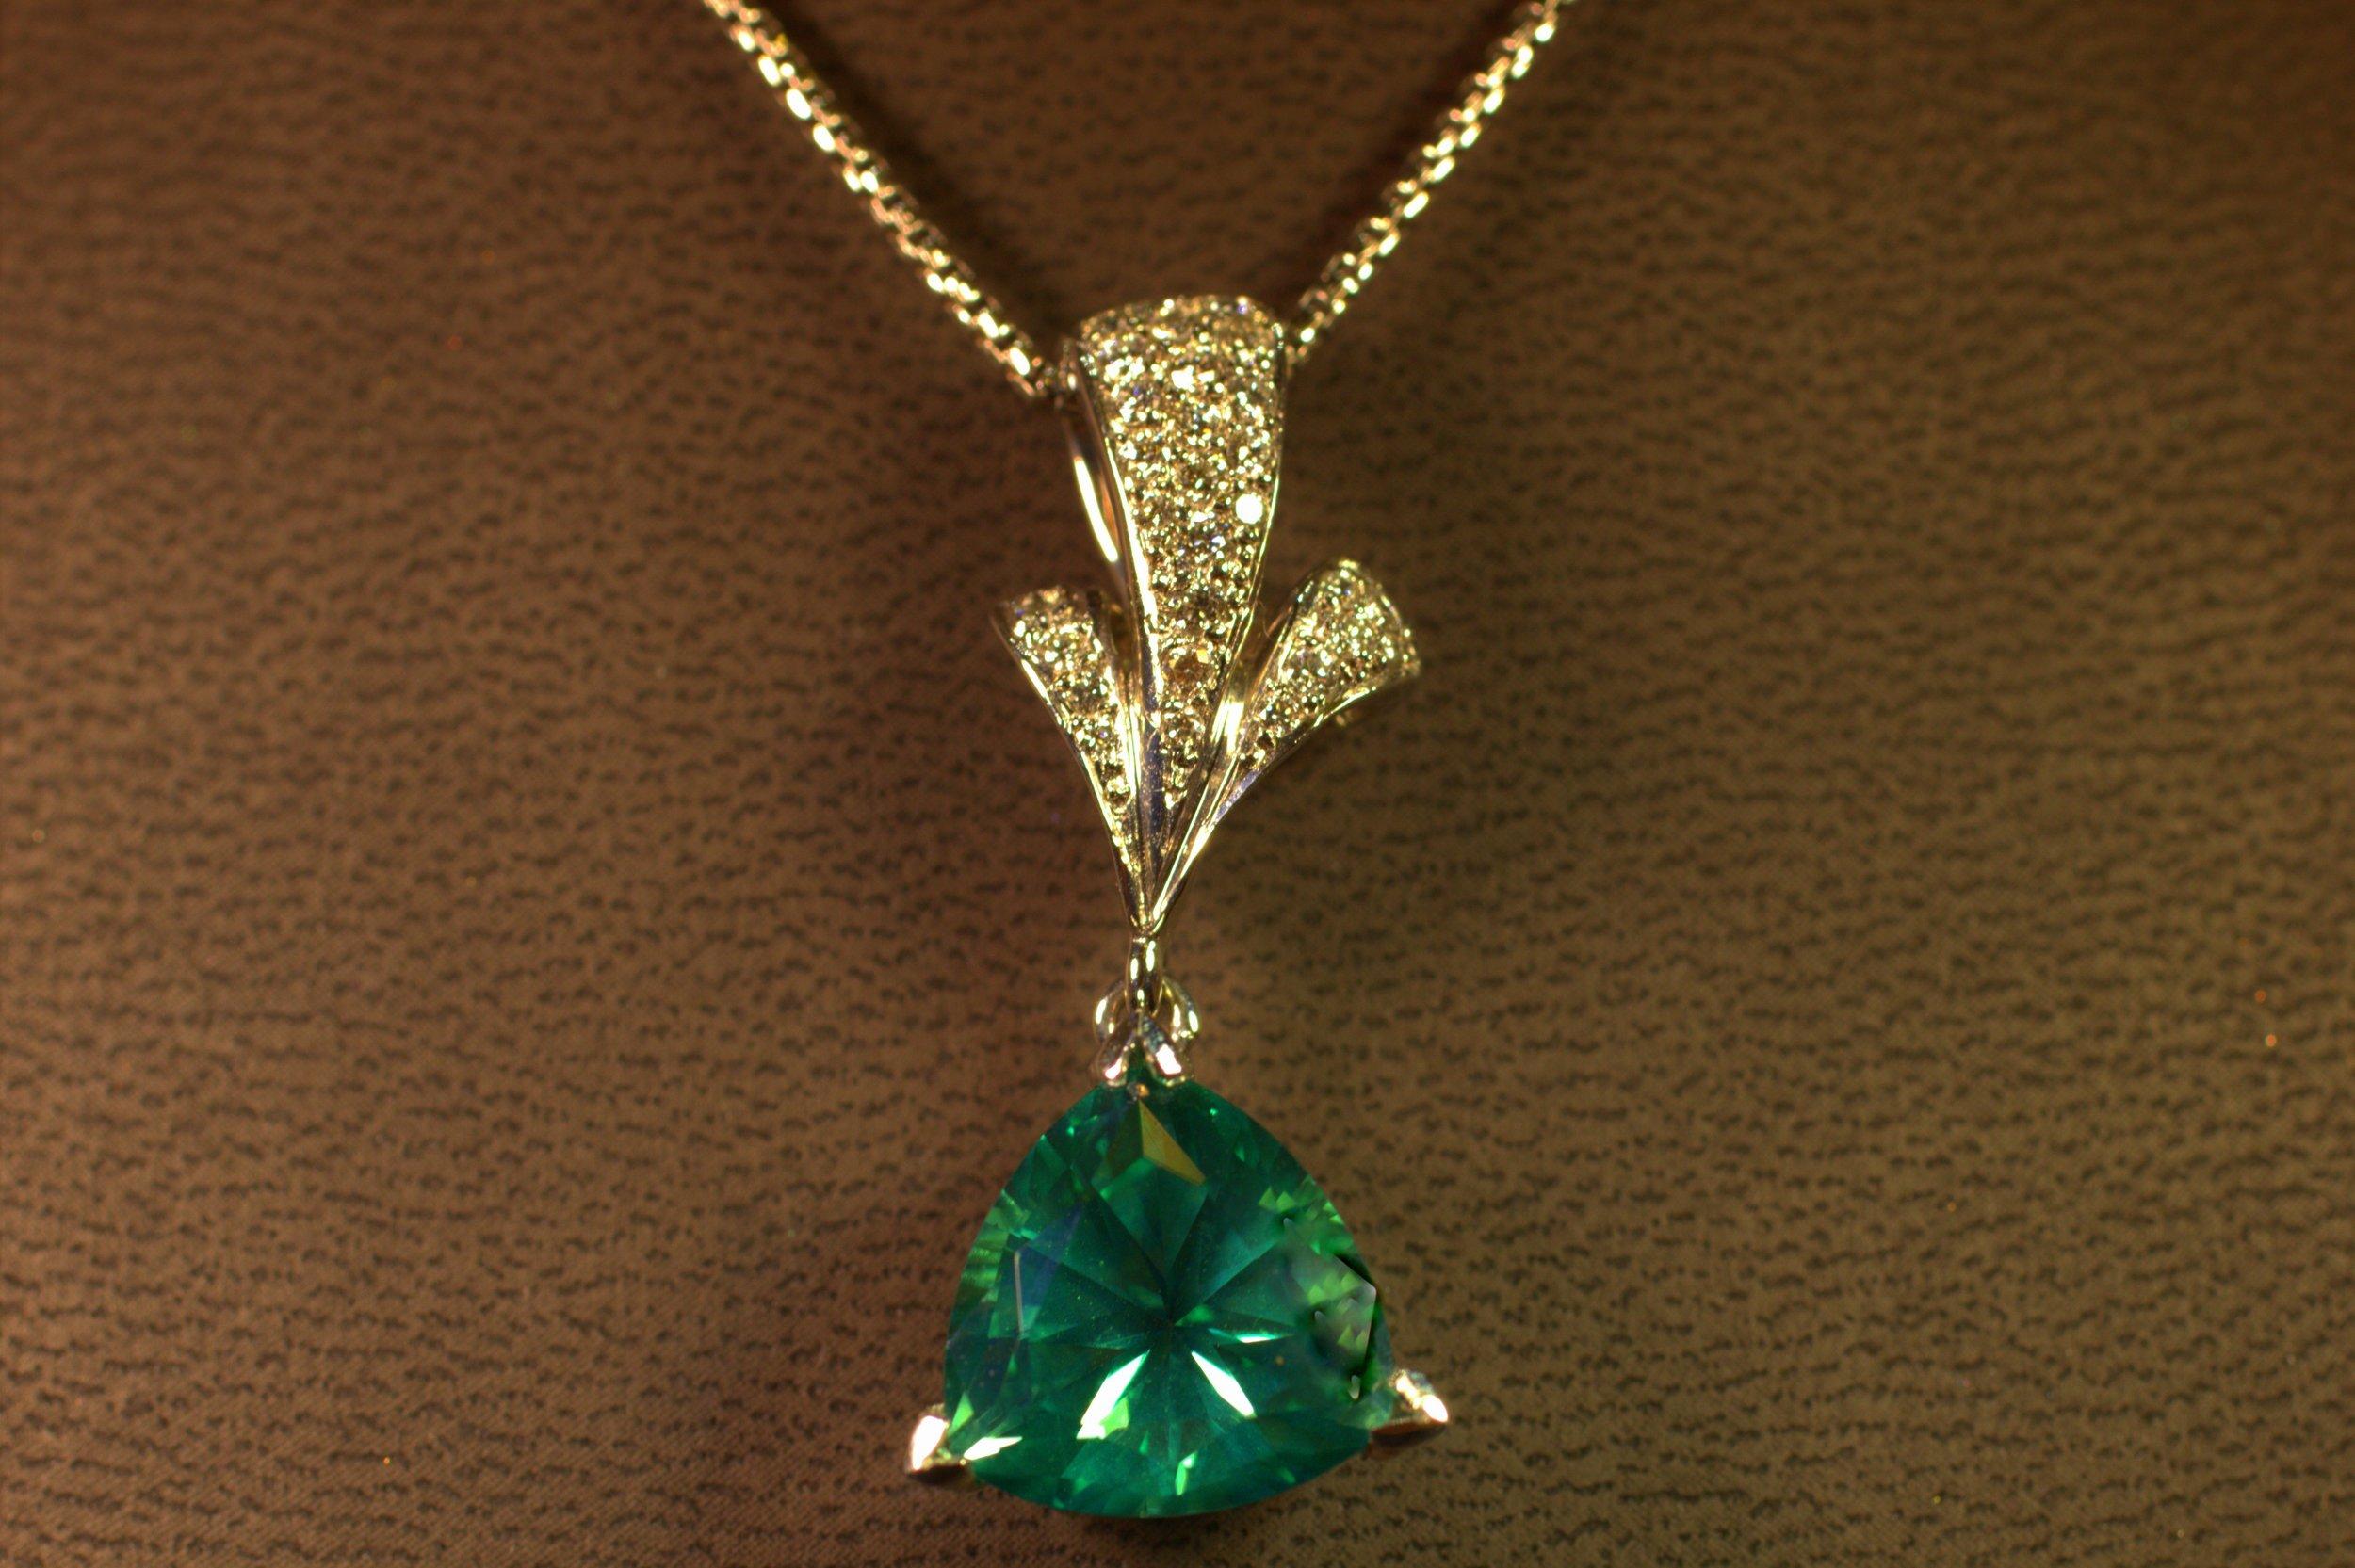 Custom seafoam green tourmaline custom pendant designed by Mark Schneider. Featuring a beautiful light seafoam green stone with diamond accent. Modern design with a classic twist.  $4750